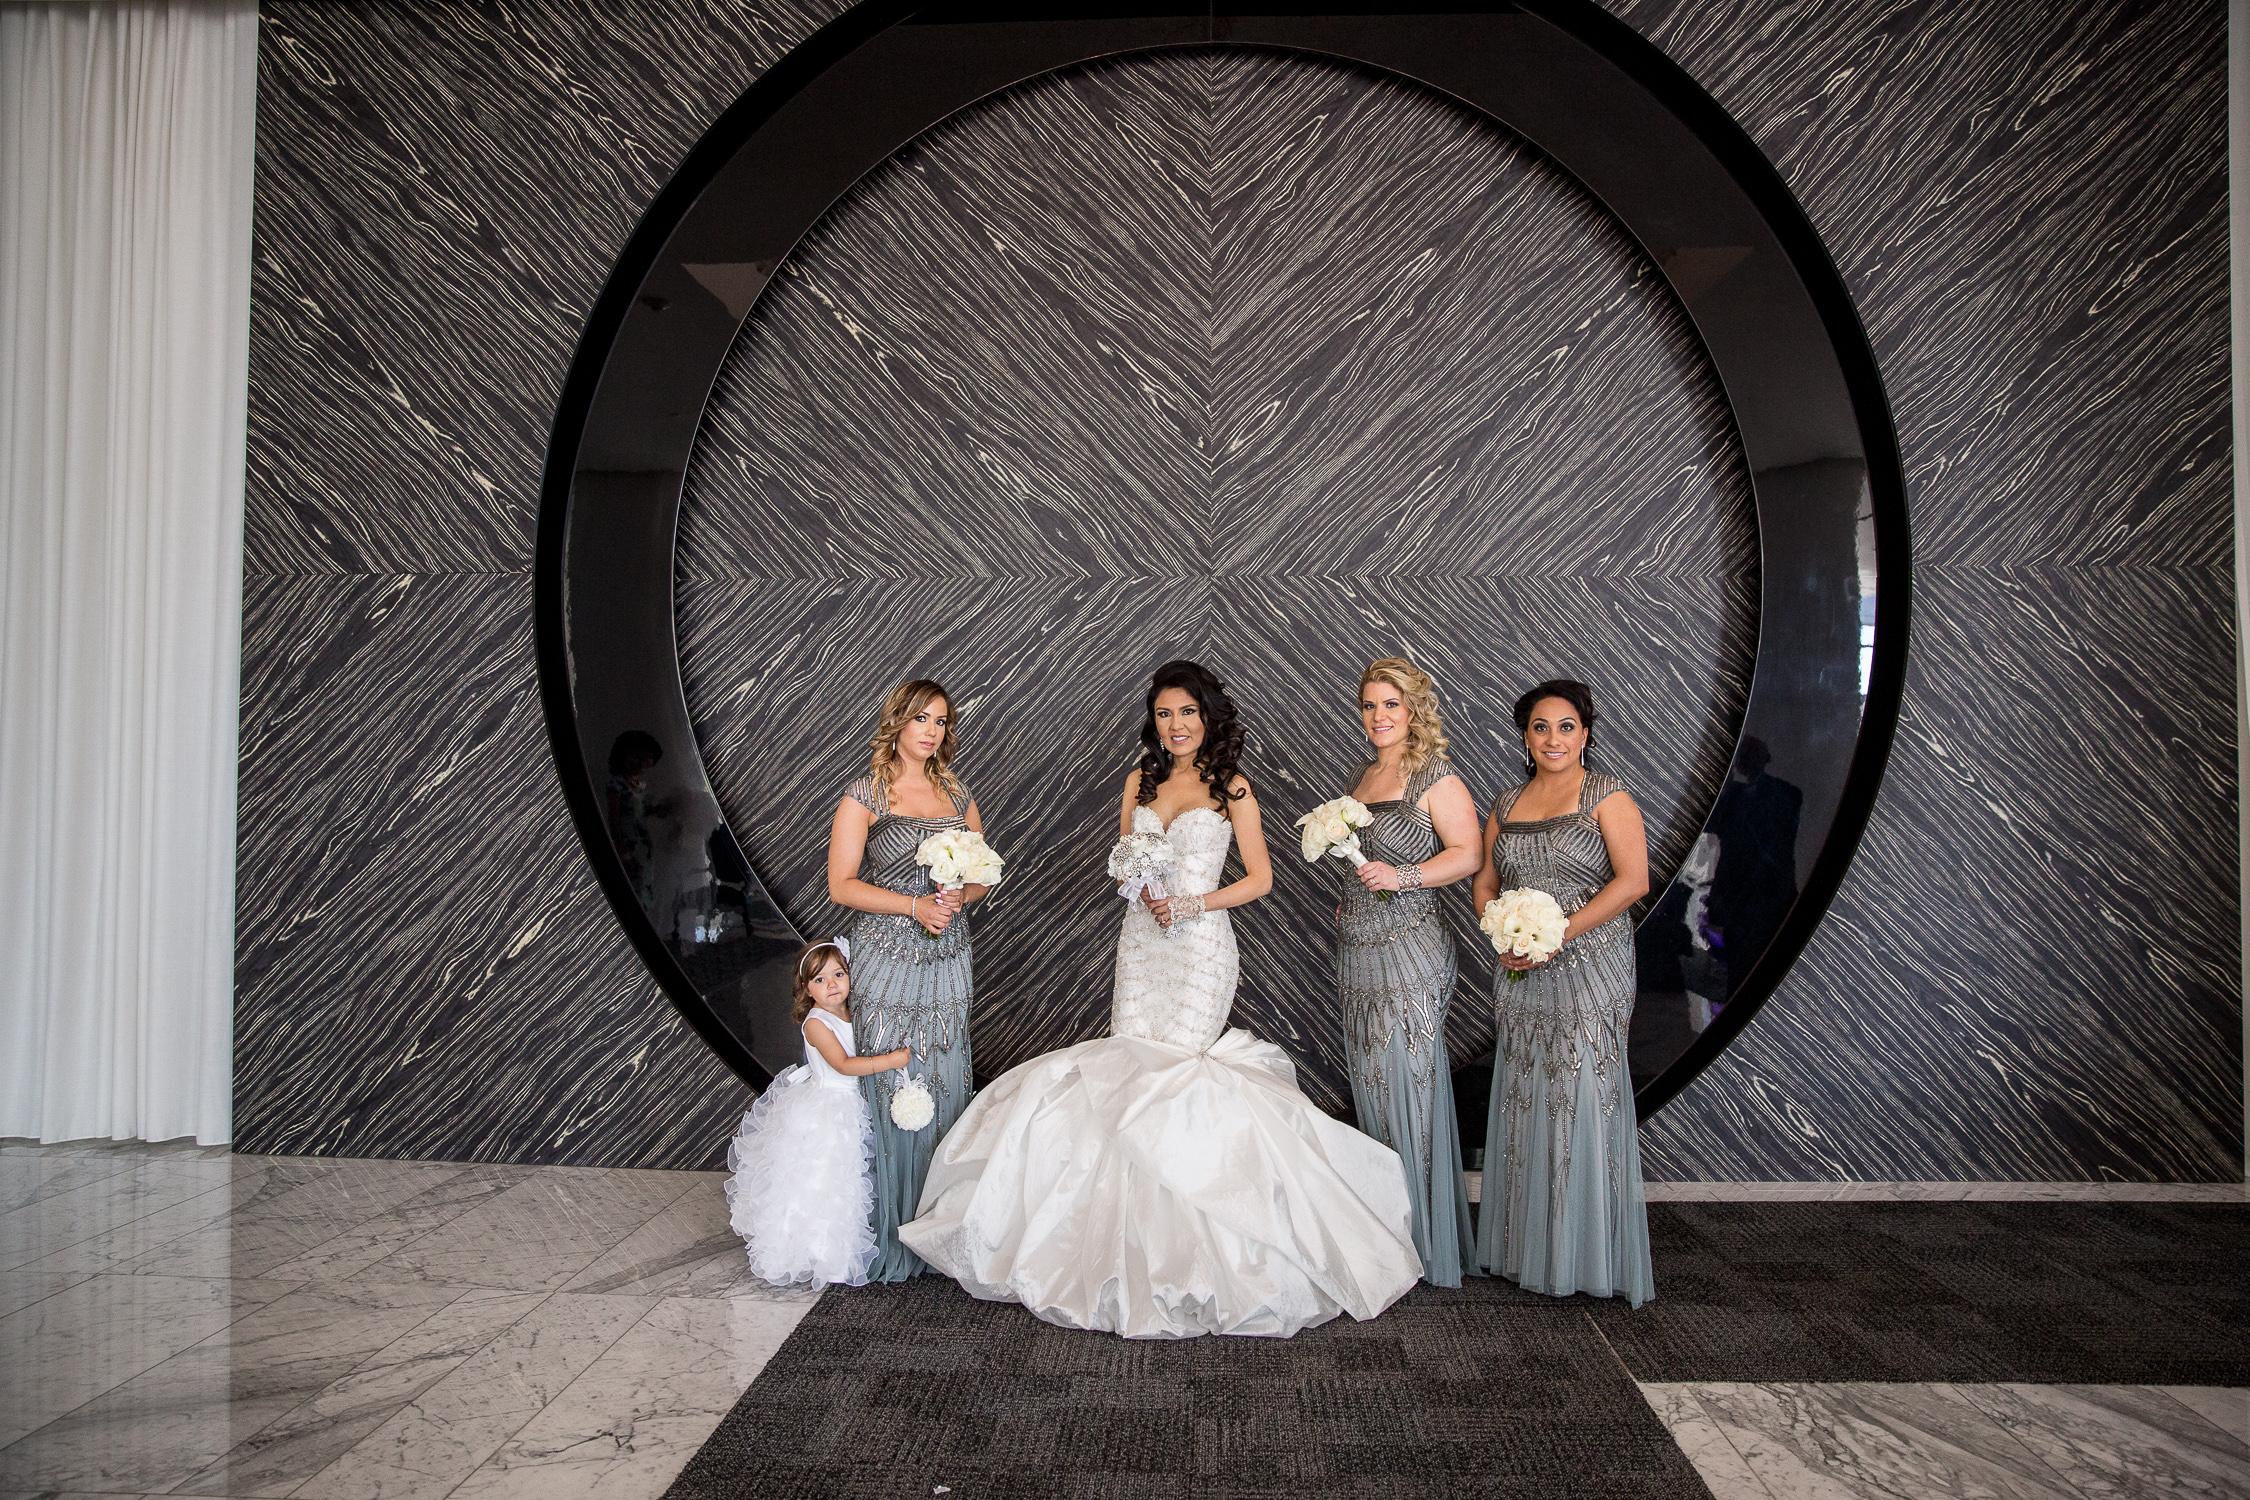 Paradise-Banquet-Hall-Wedding-Vaughan-Ontario-0019.jpg